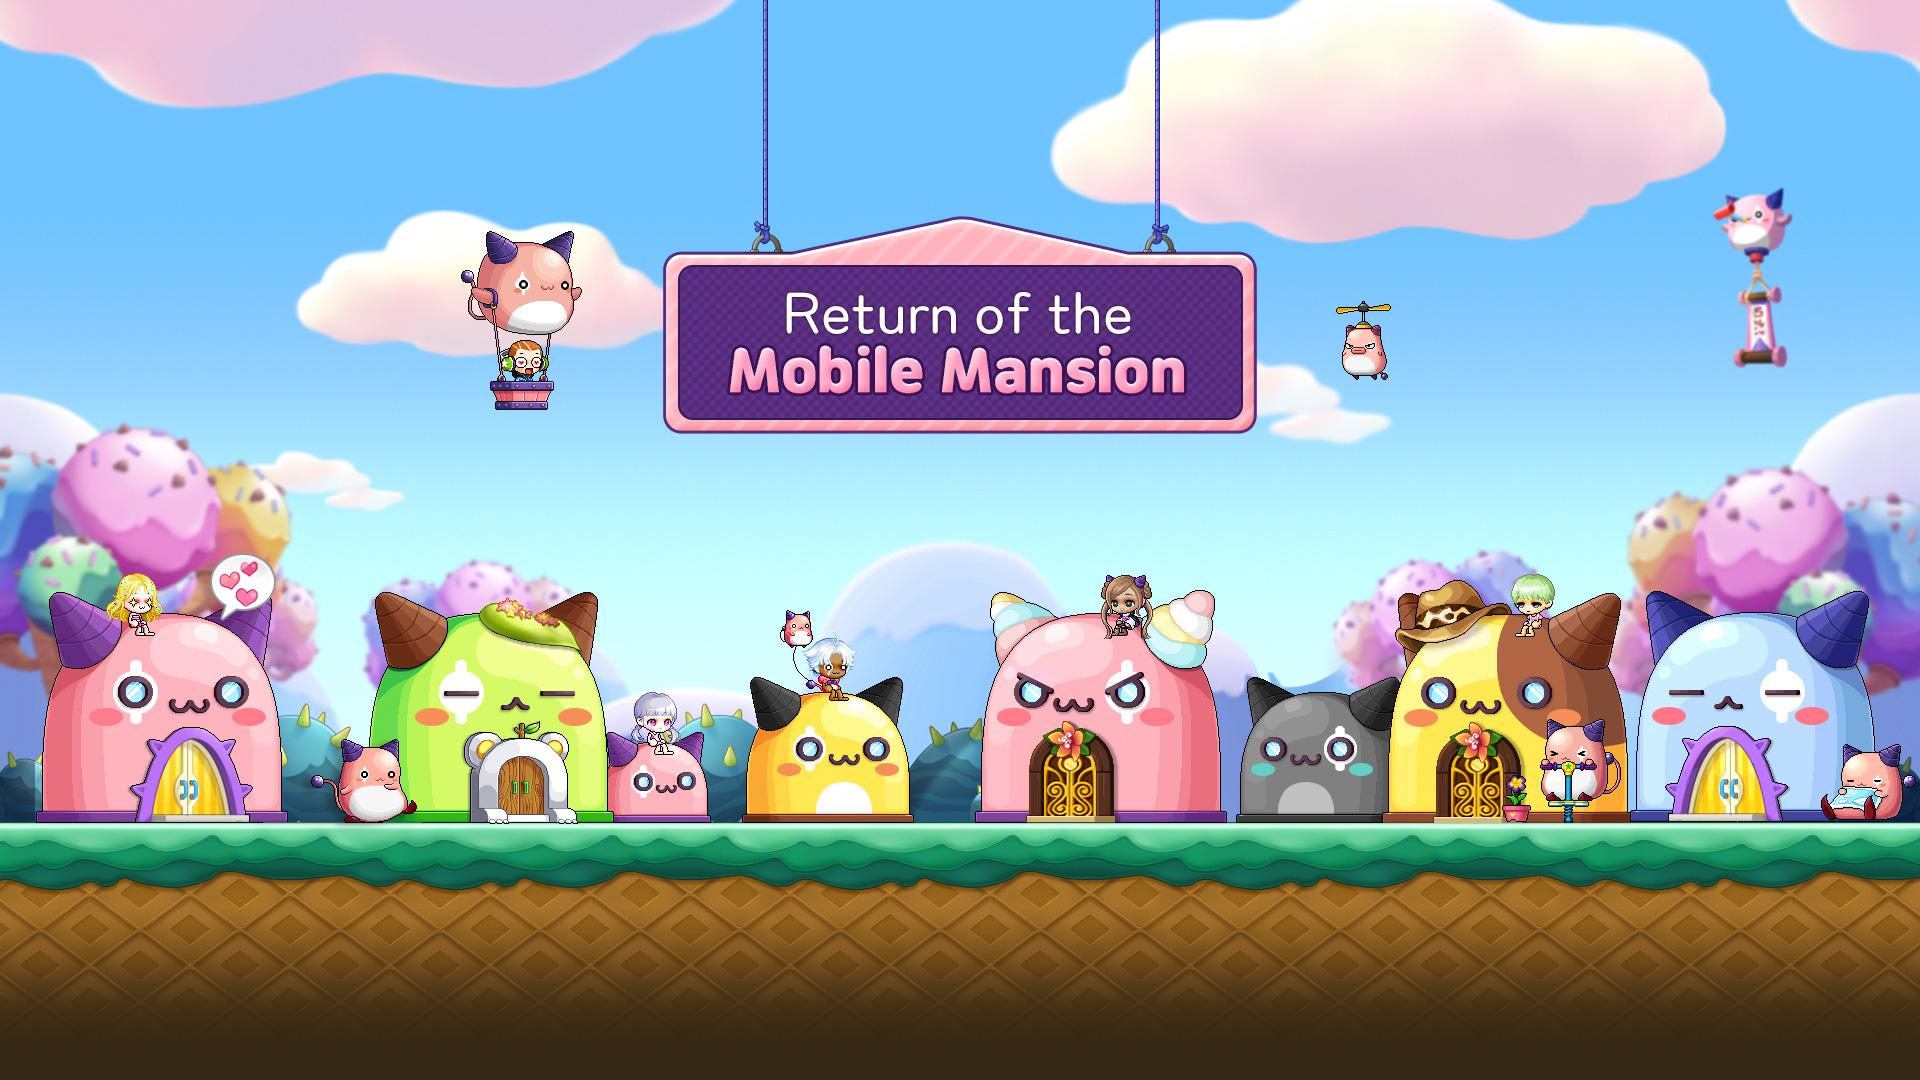 Return of the Mobile Mansion!